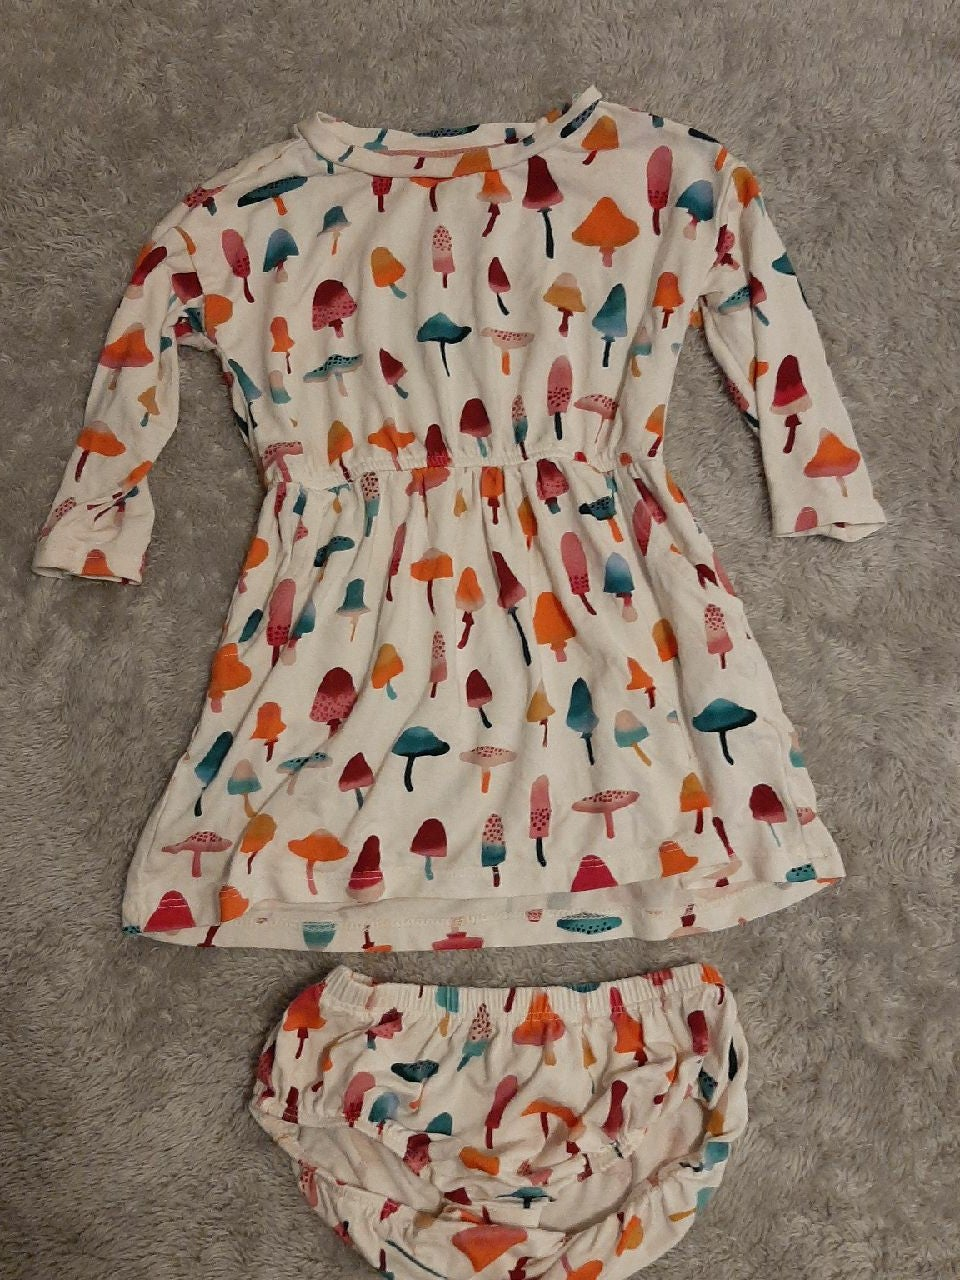 Babygirls toadstool mushrooms dress 6/12